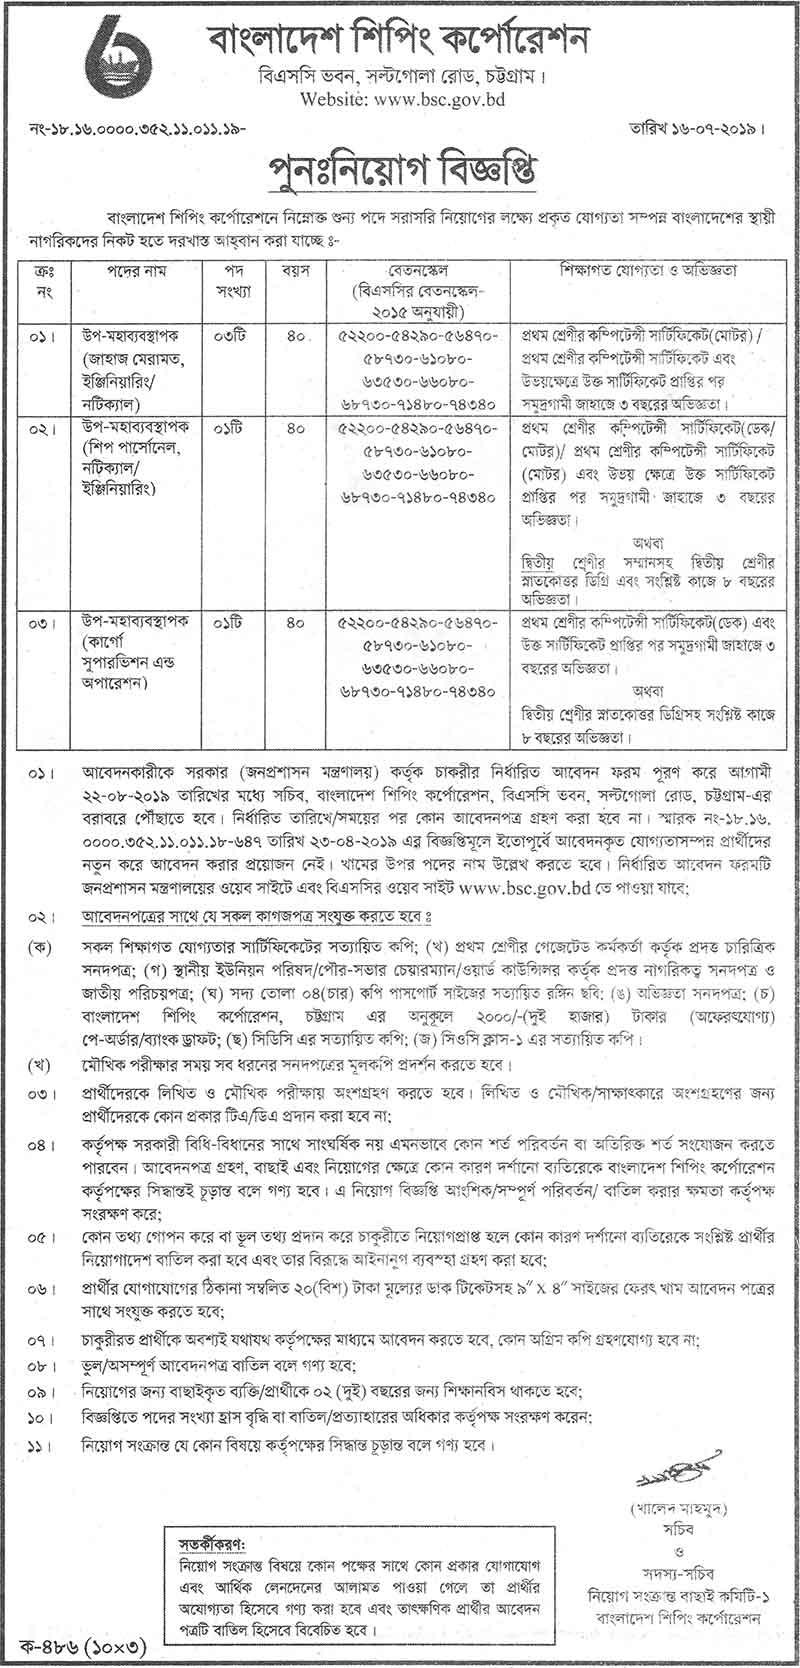 Bangladesh Shipping Corporation Job Circular 2019